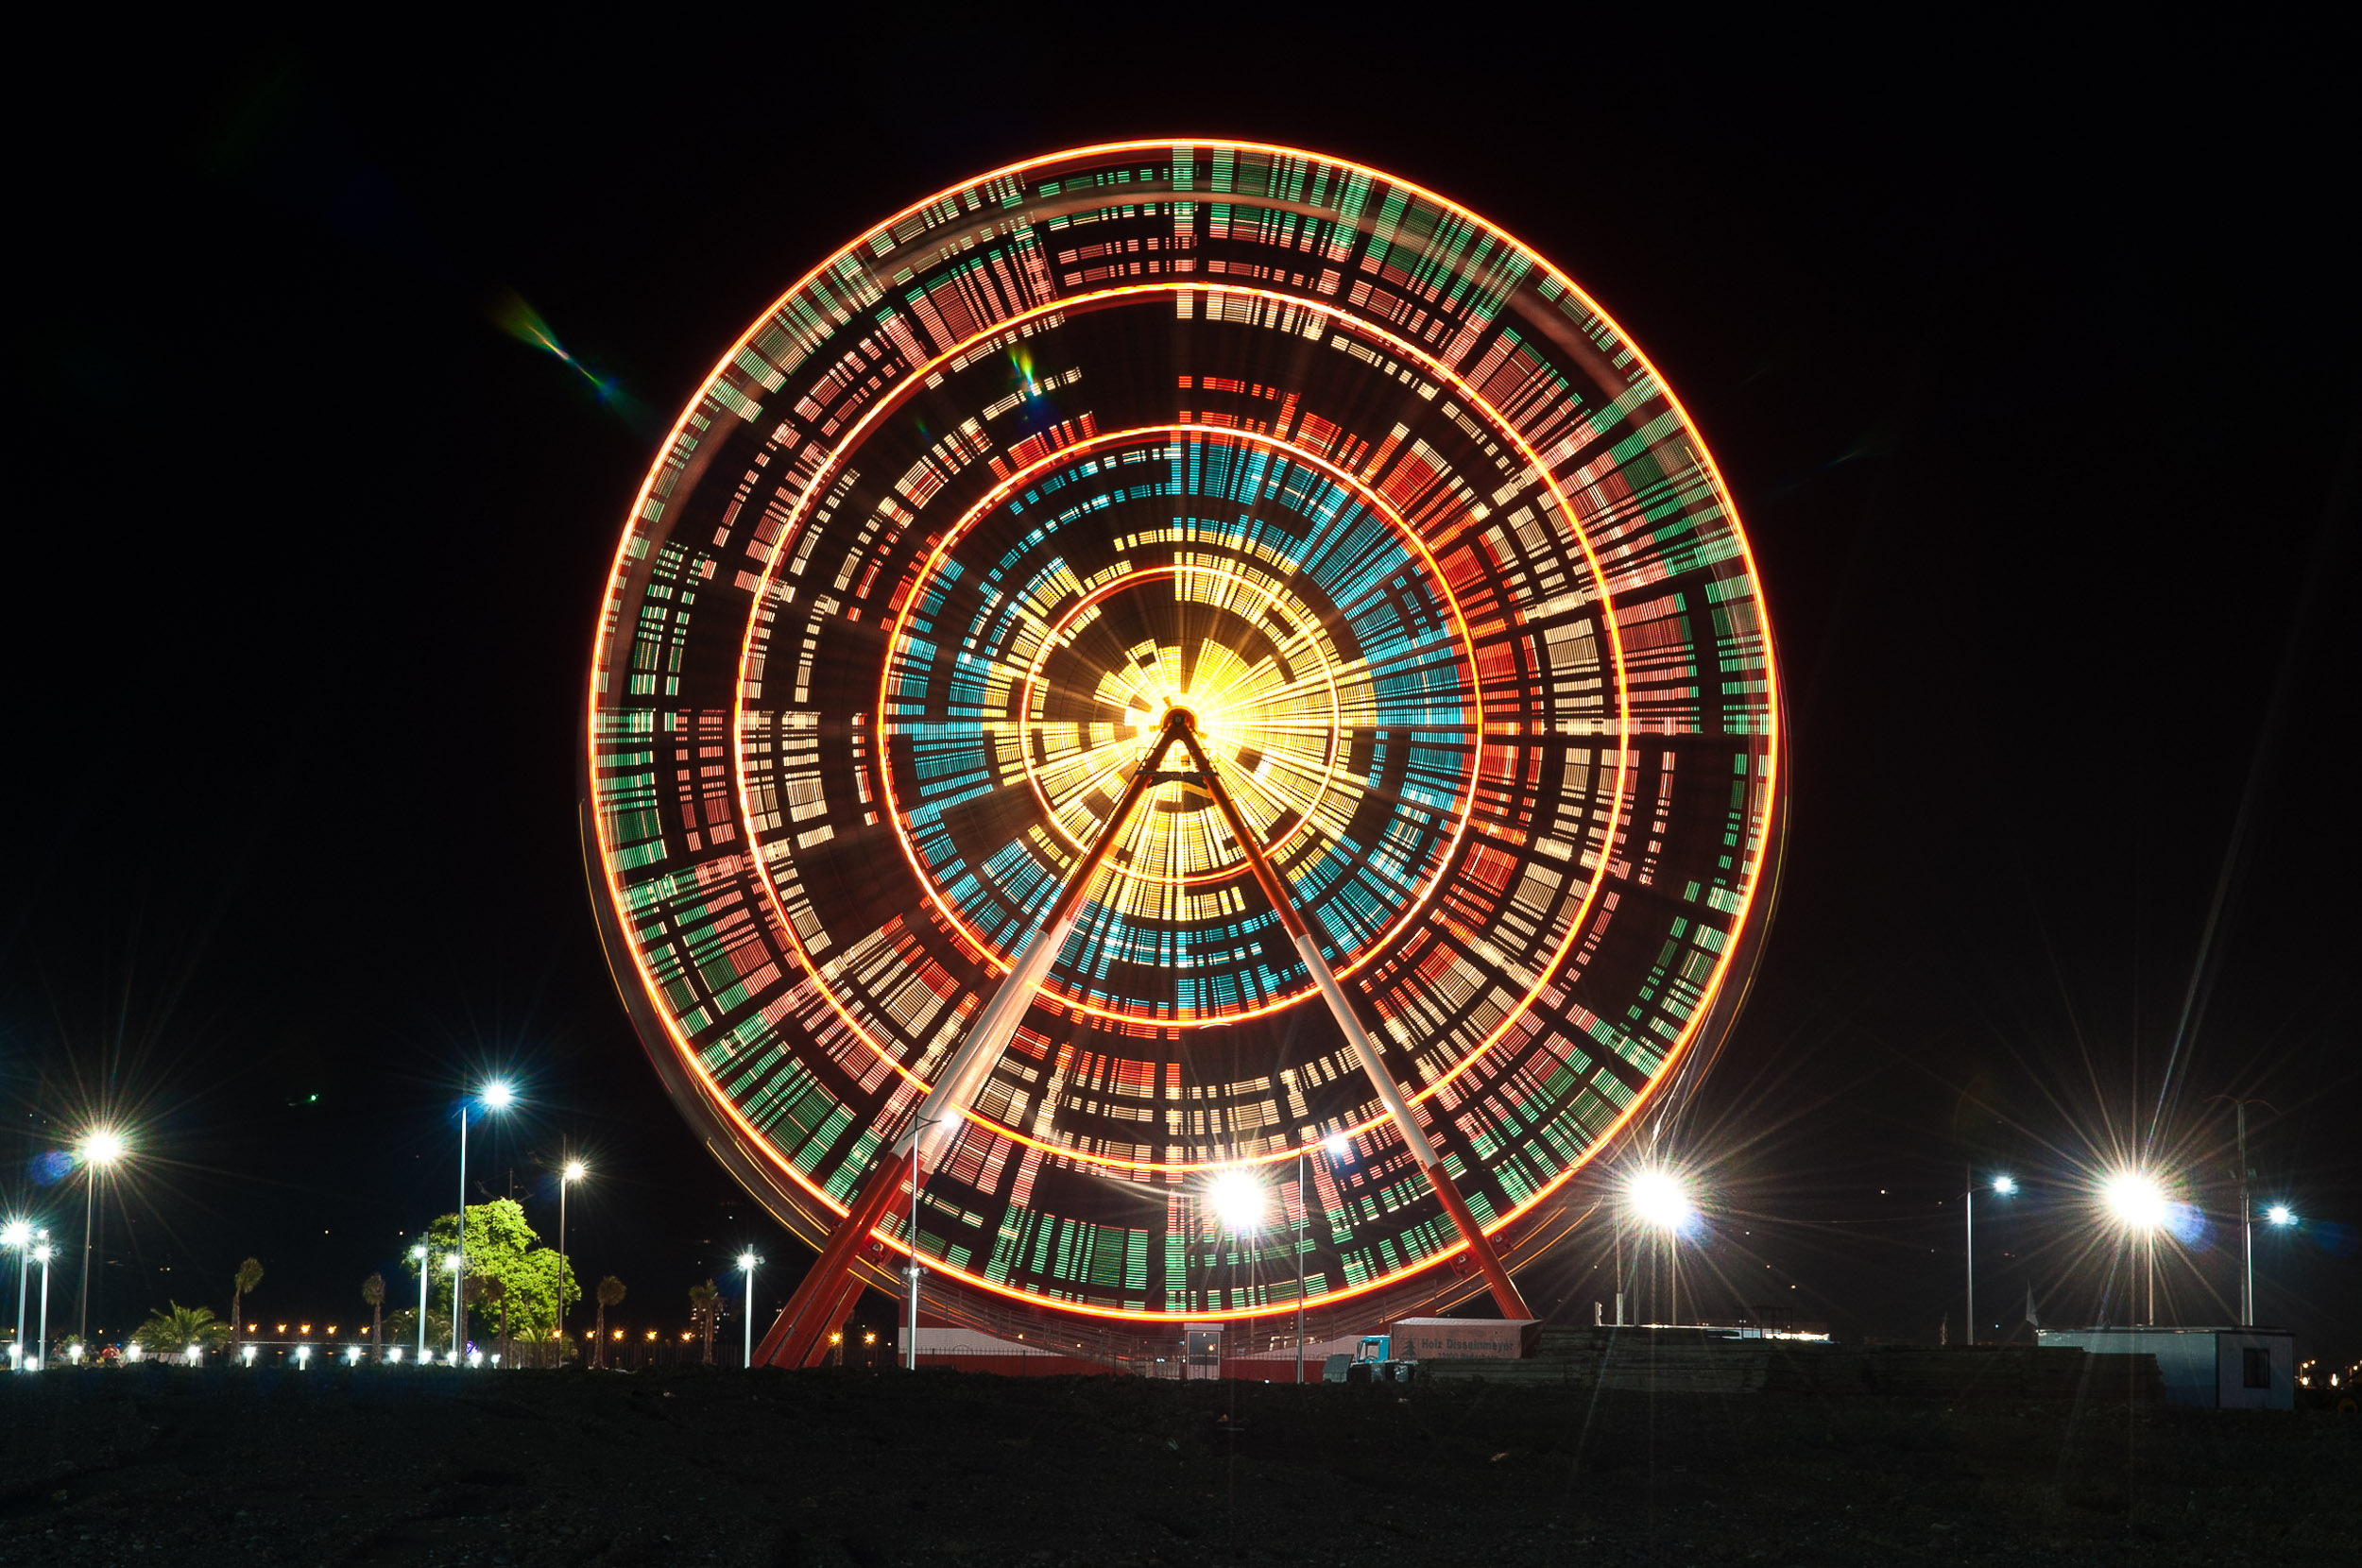 Ferris wheel time lapse, Batumi, Georgia.